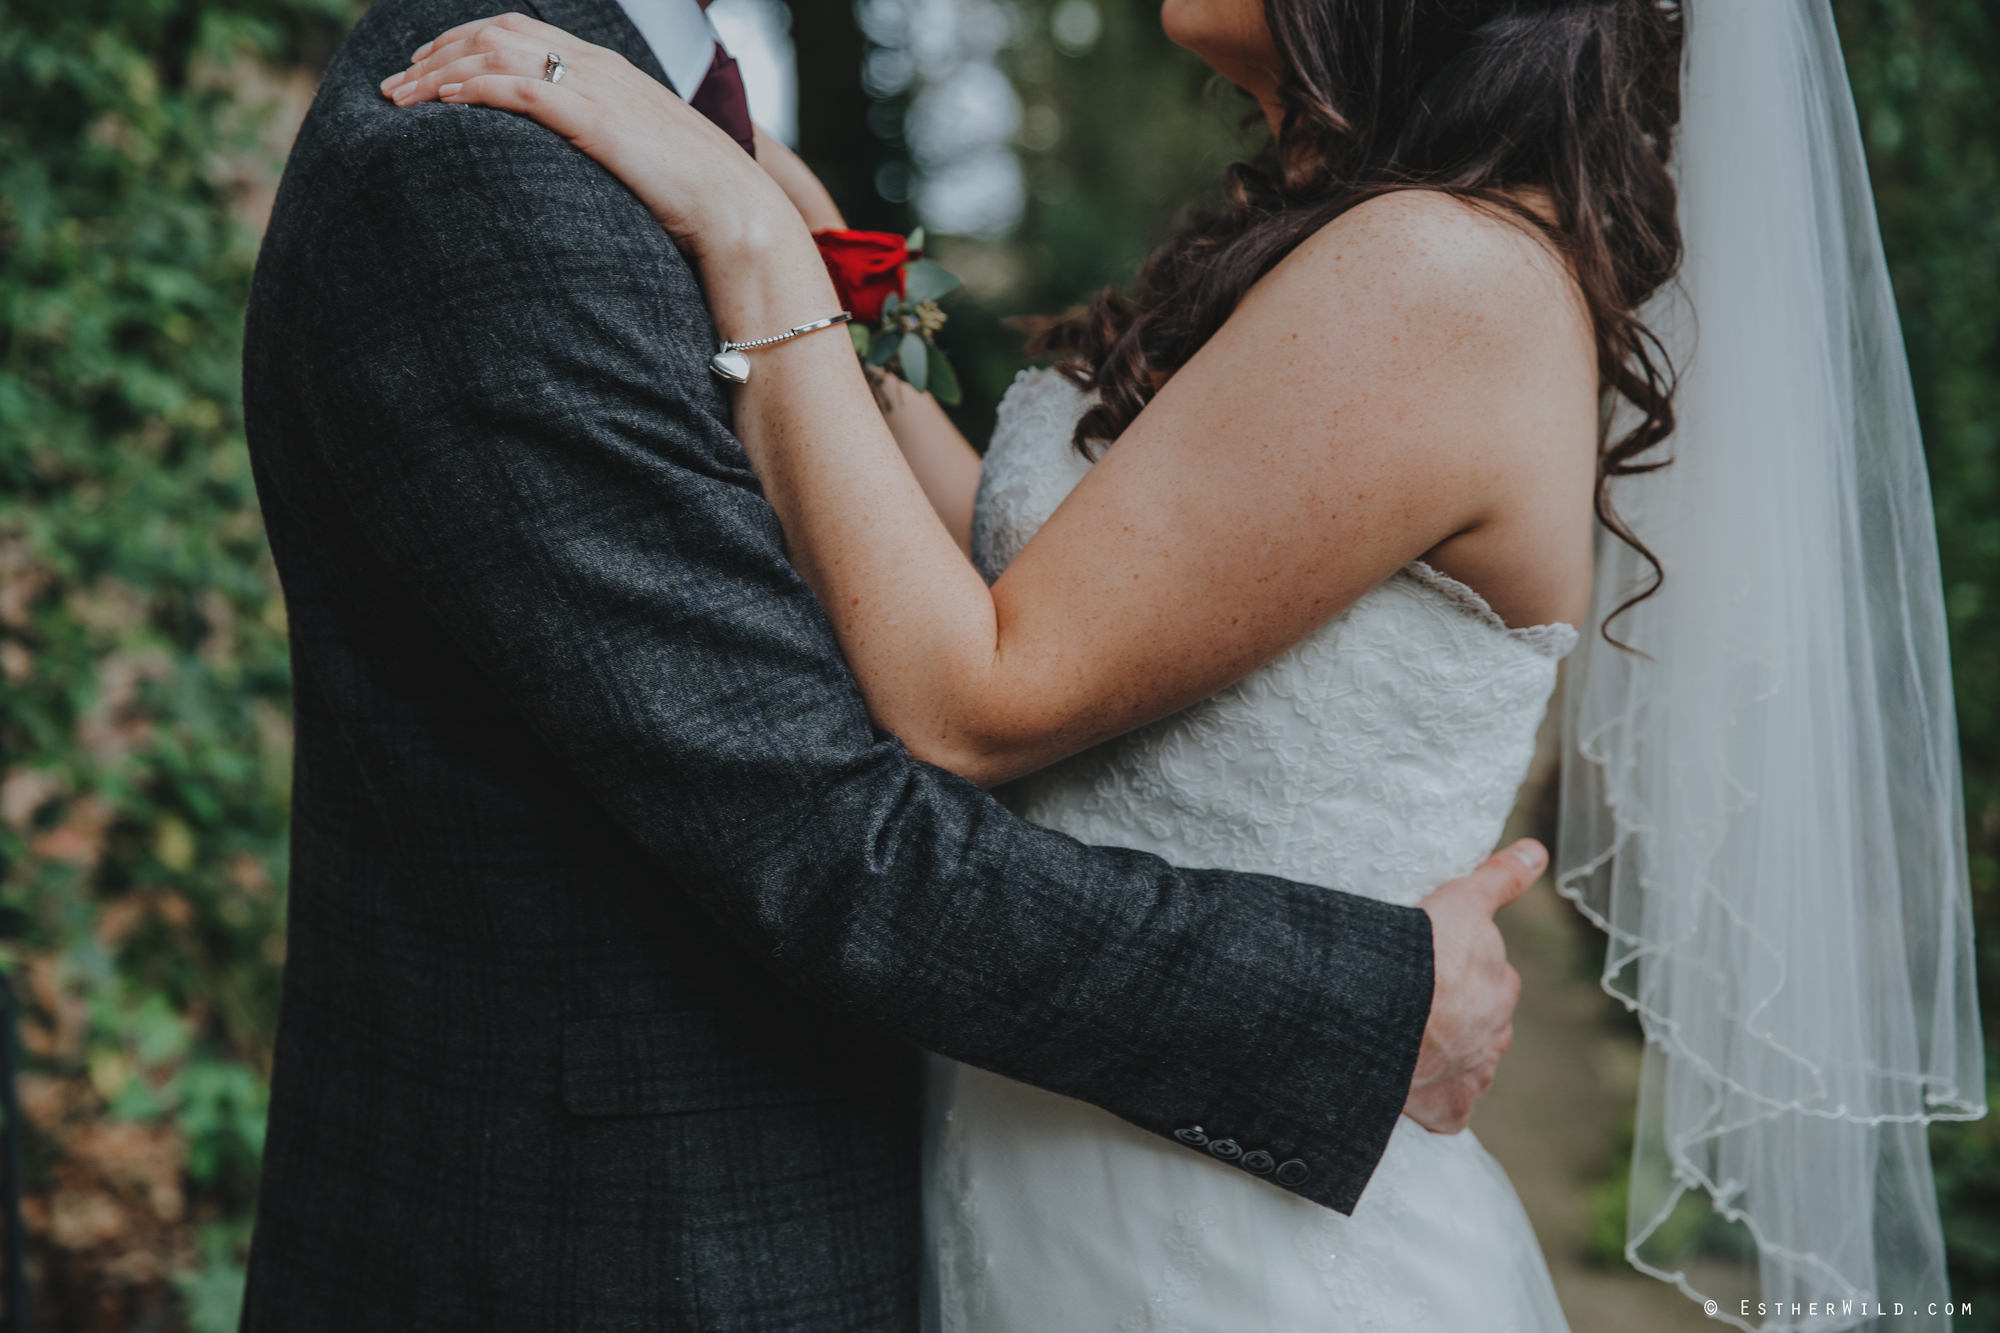 Reading_Room_Weddings_Alby_Norwich_Photographer_Esther_Wild_IMG_1801.jpg